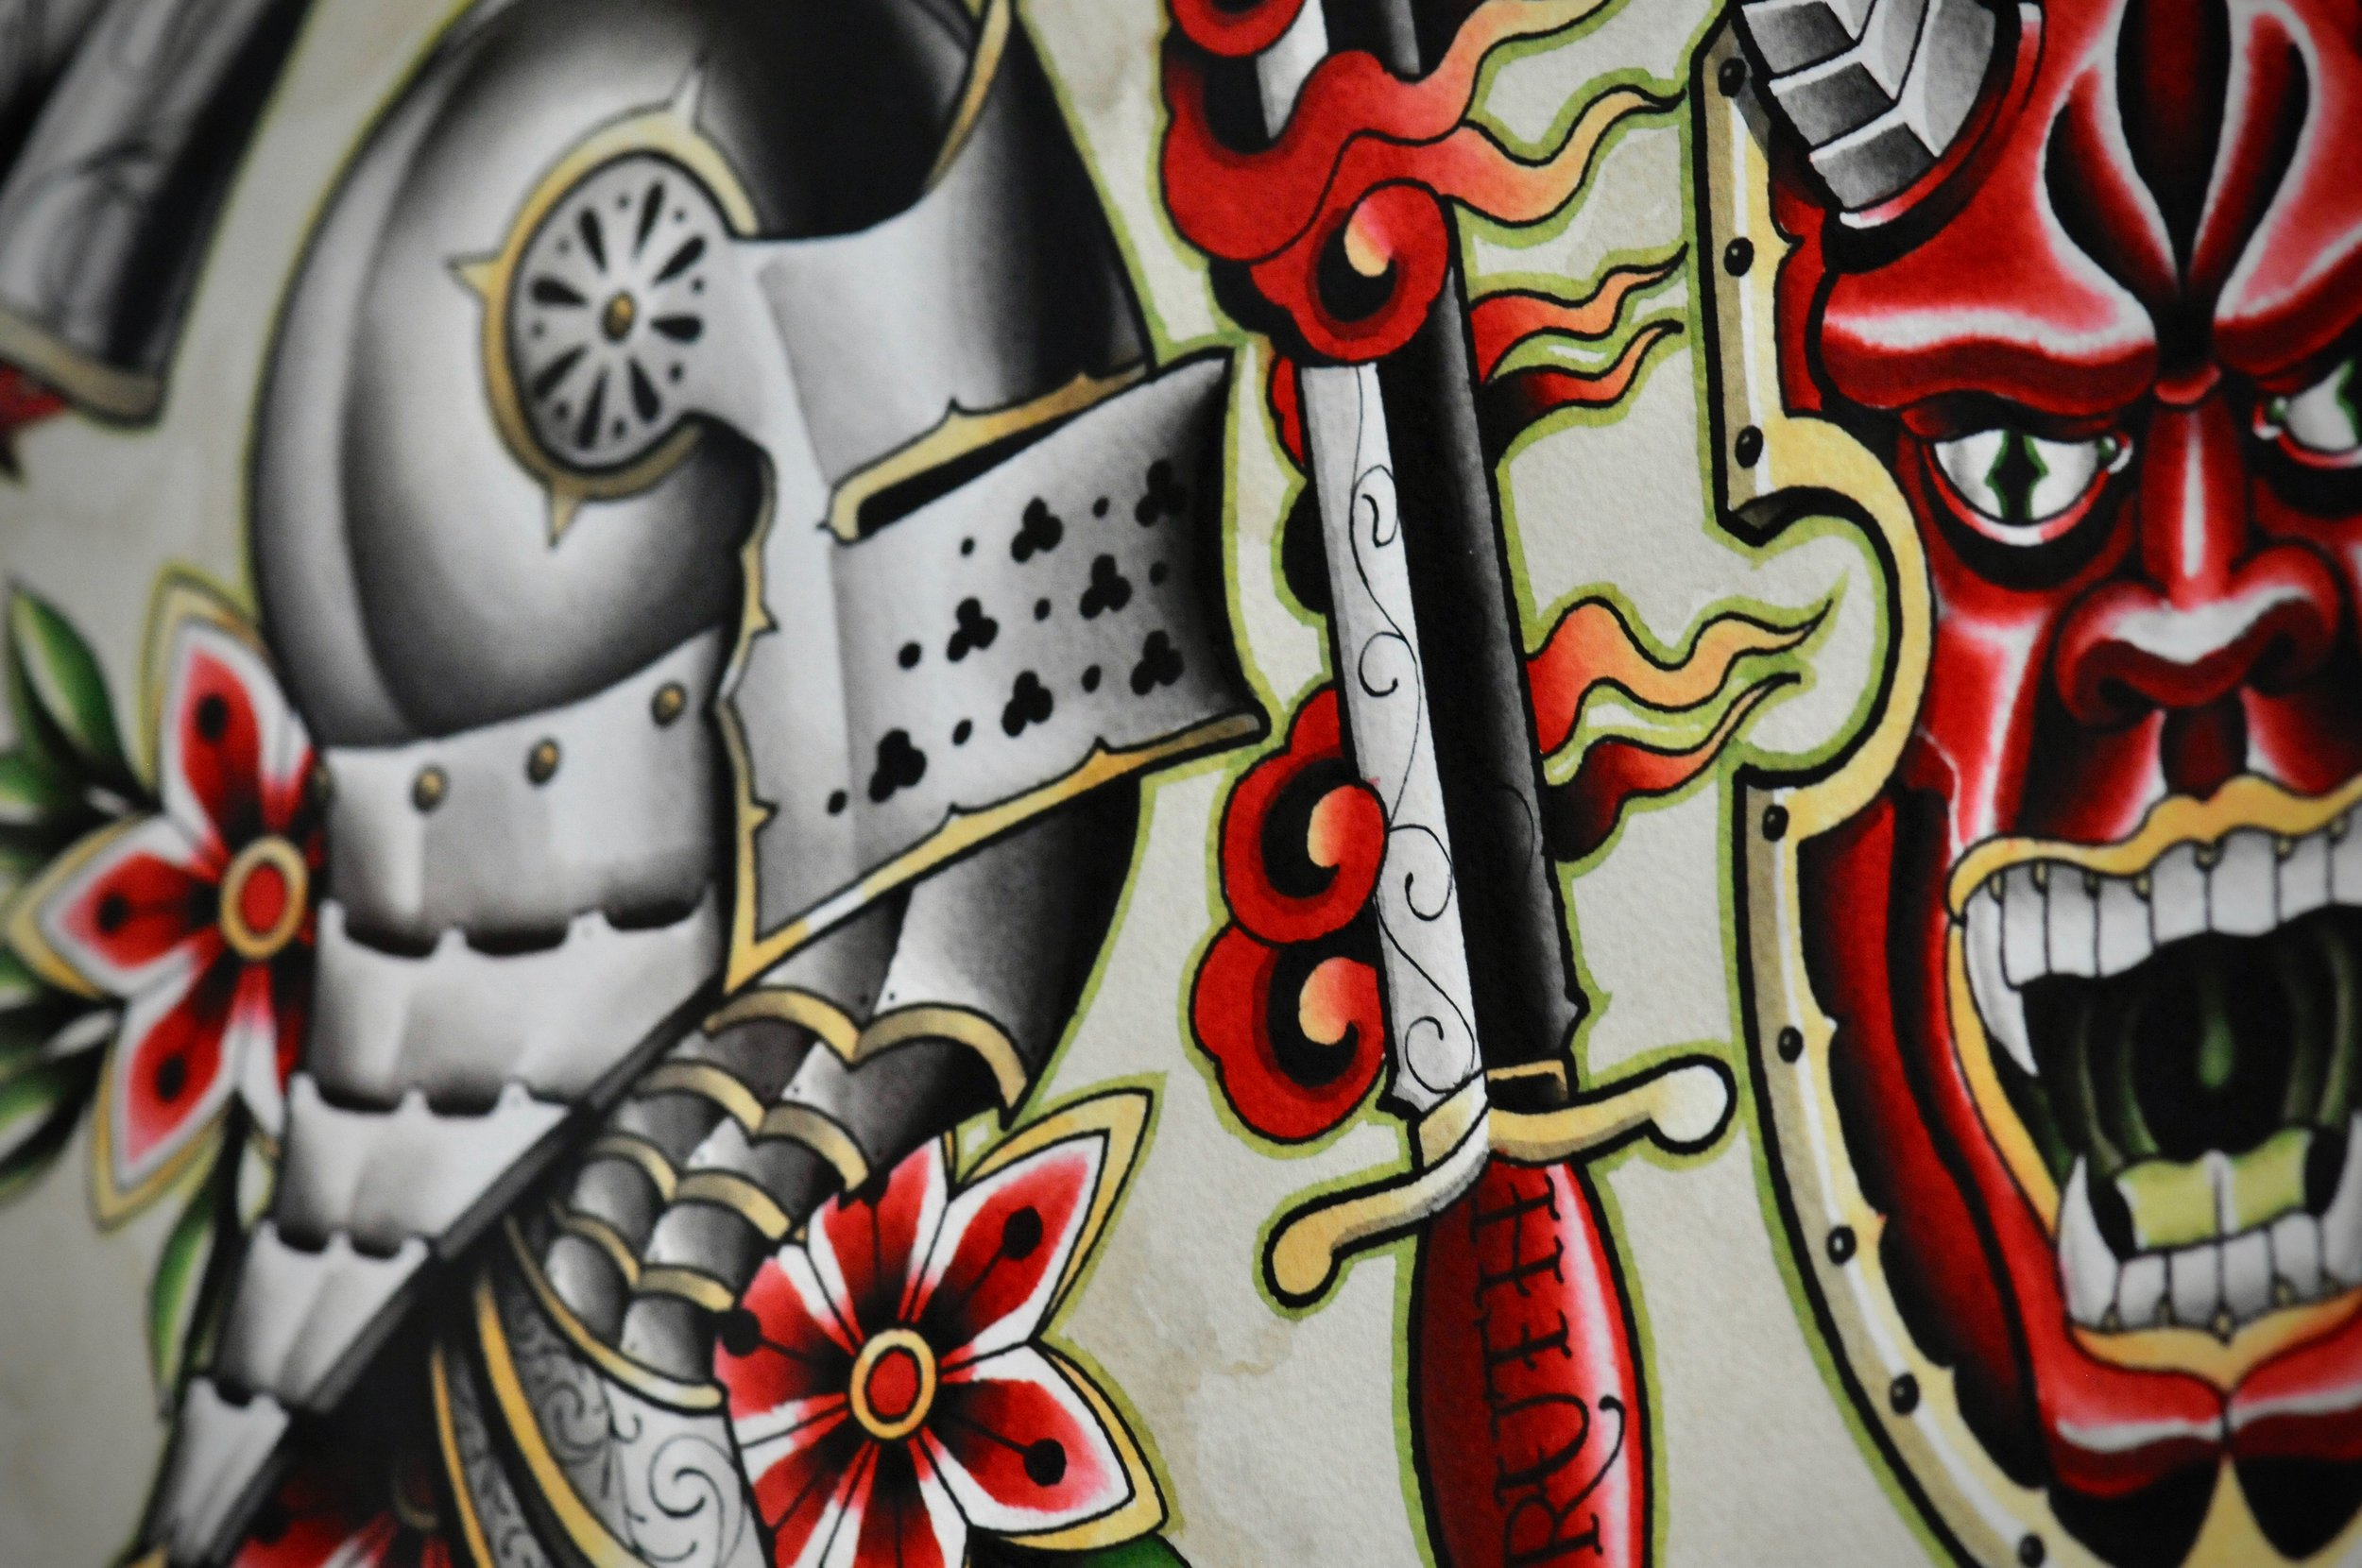 the-east-tattoo---salon-design_29739119847_o.jpg